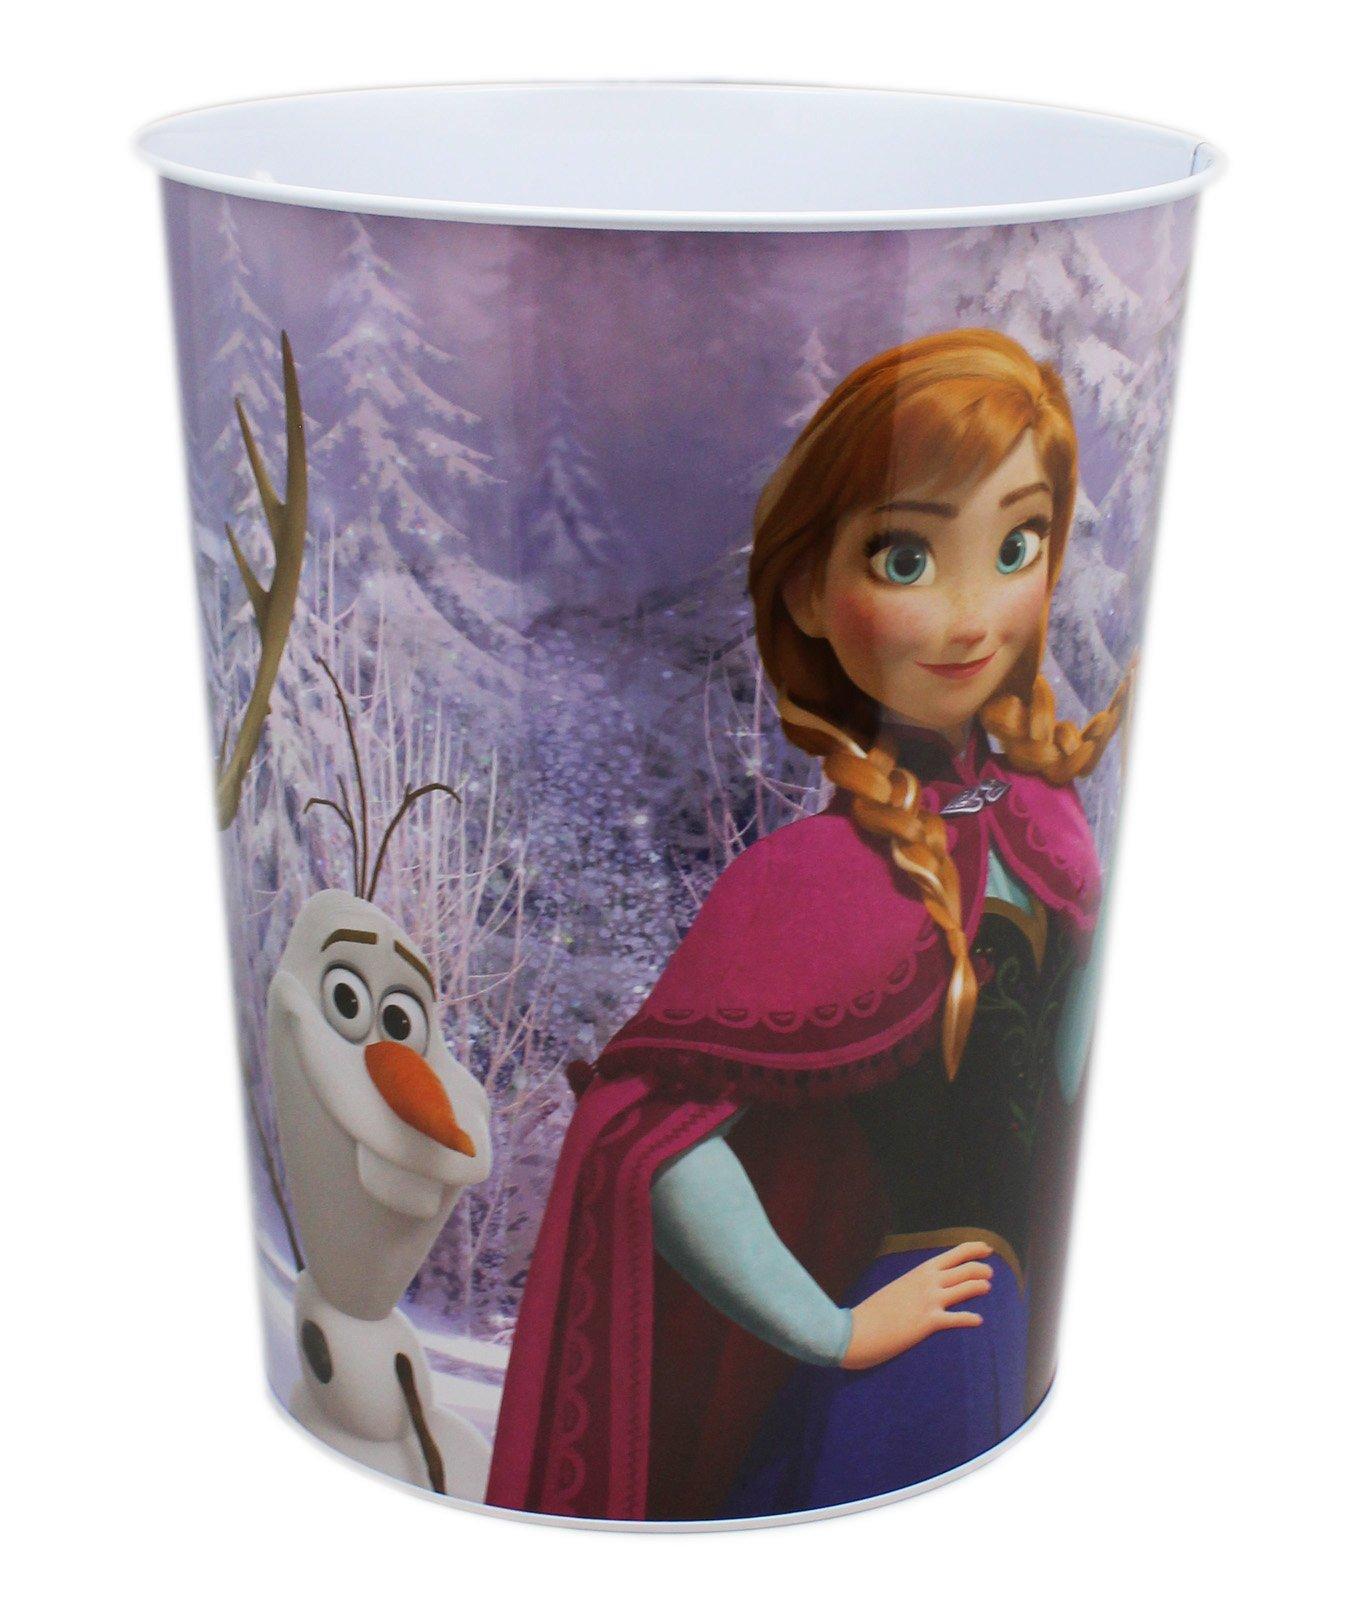 Disney's Frozen Decorative Tin Single Room Trash Can